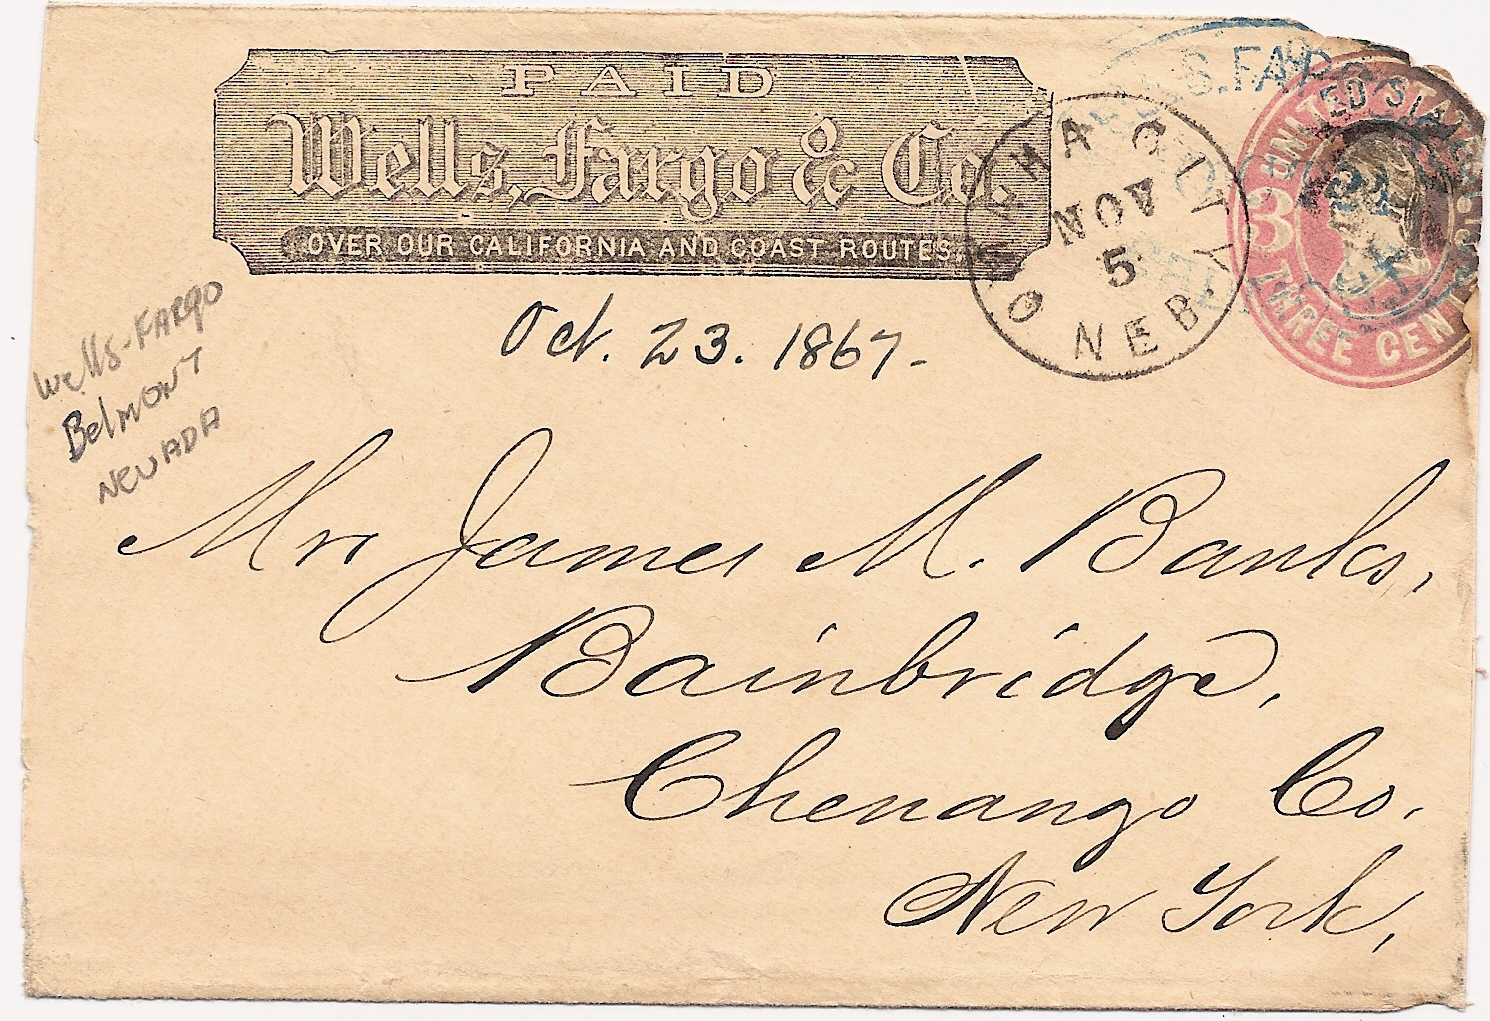 OmahaCity 1867 11 05 WellsFargo